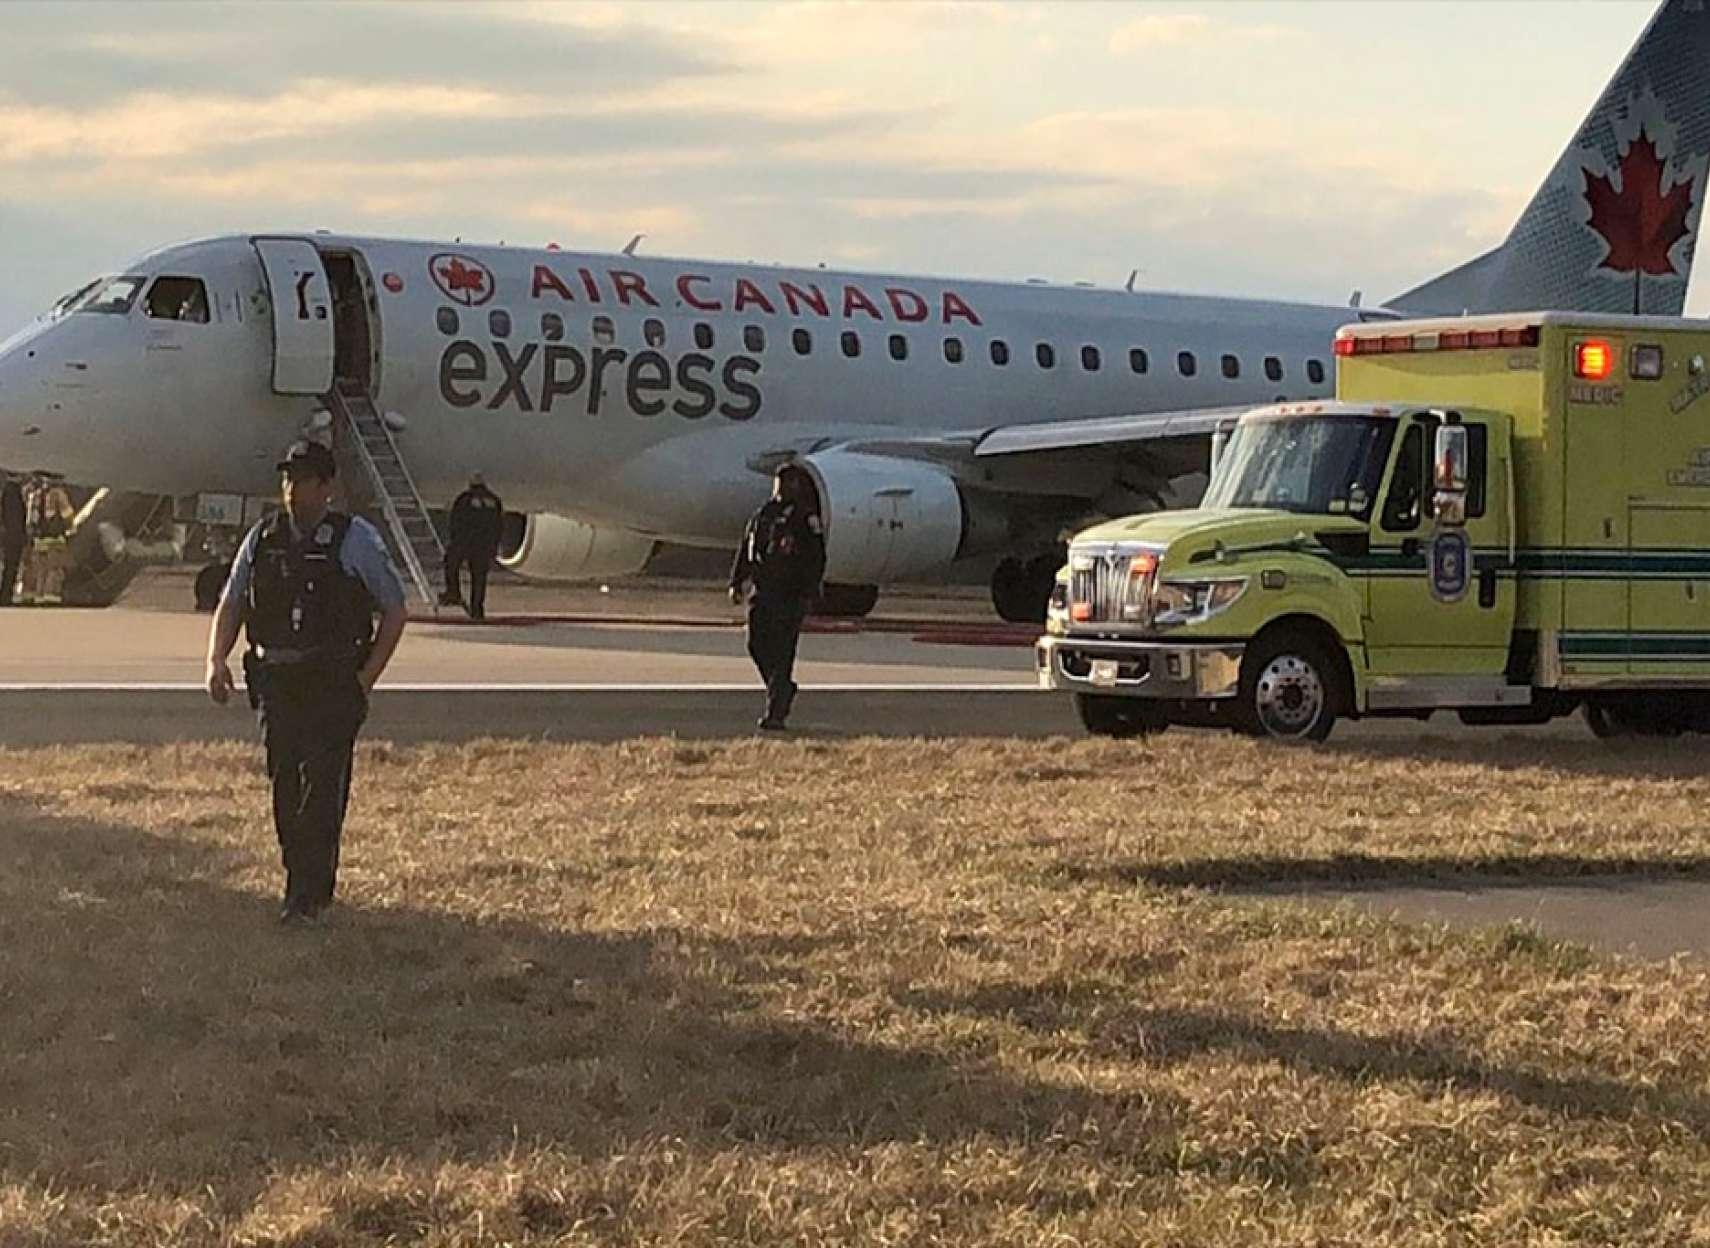 news-aircanada-emergency-land